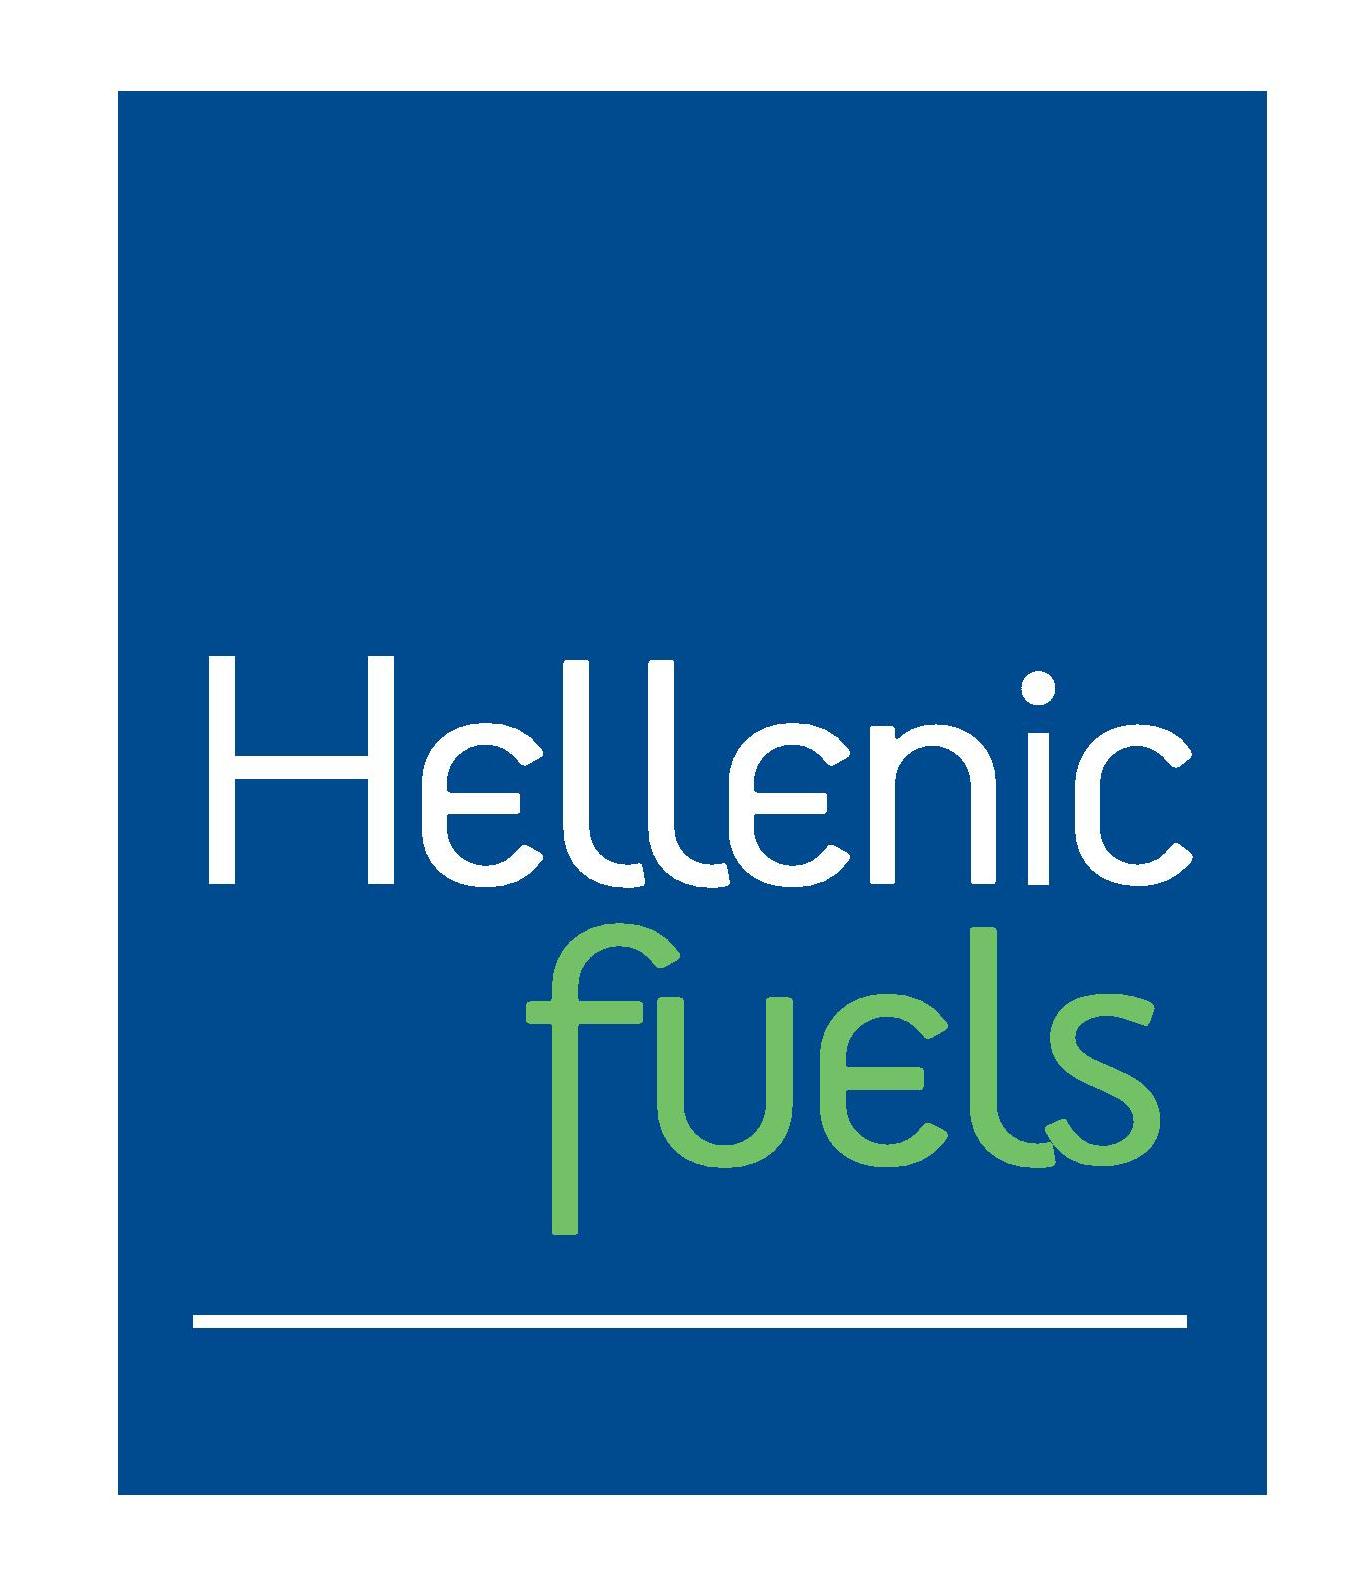 hellenicfuels